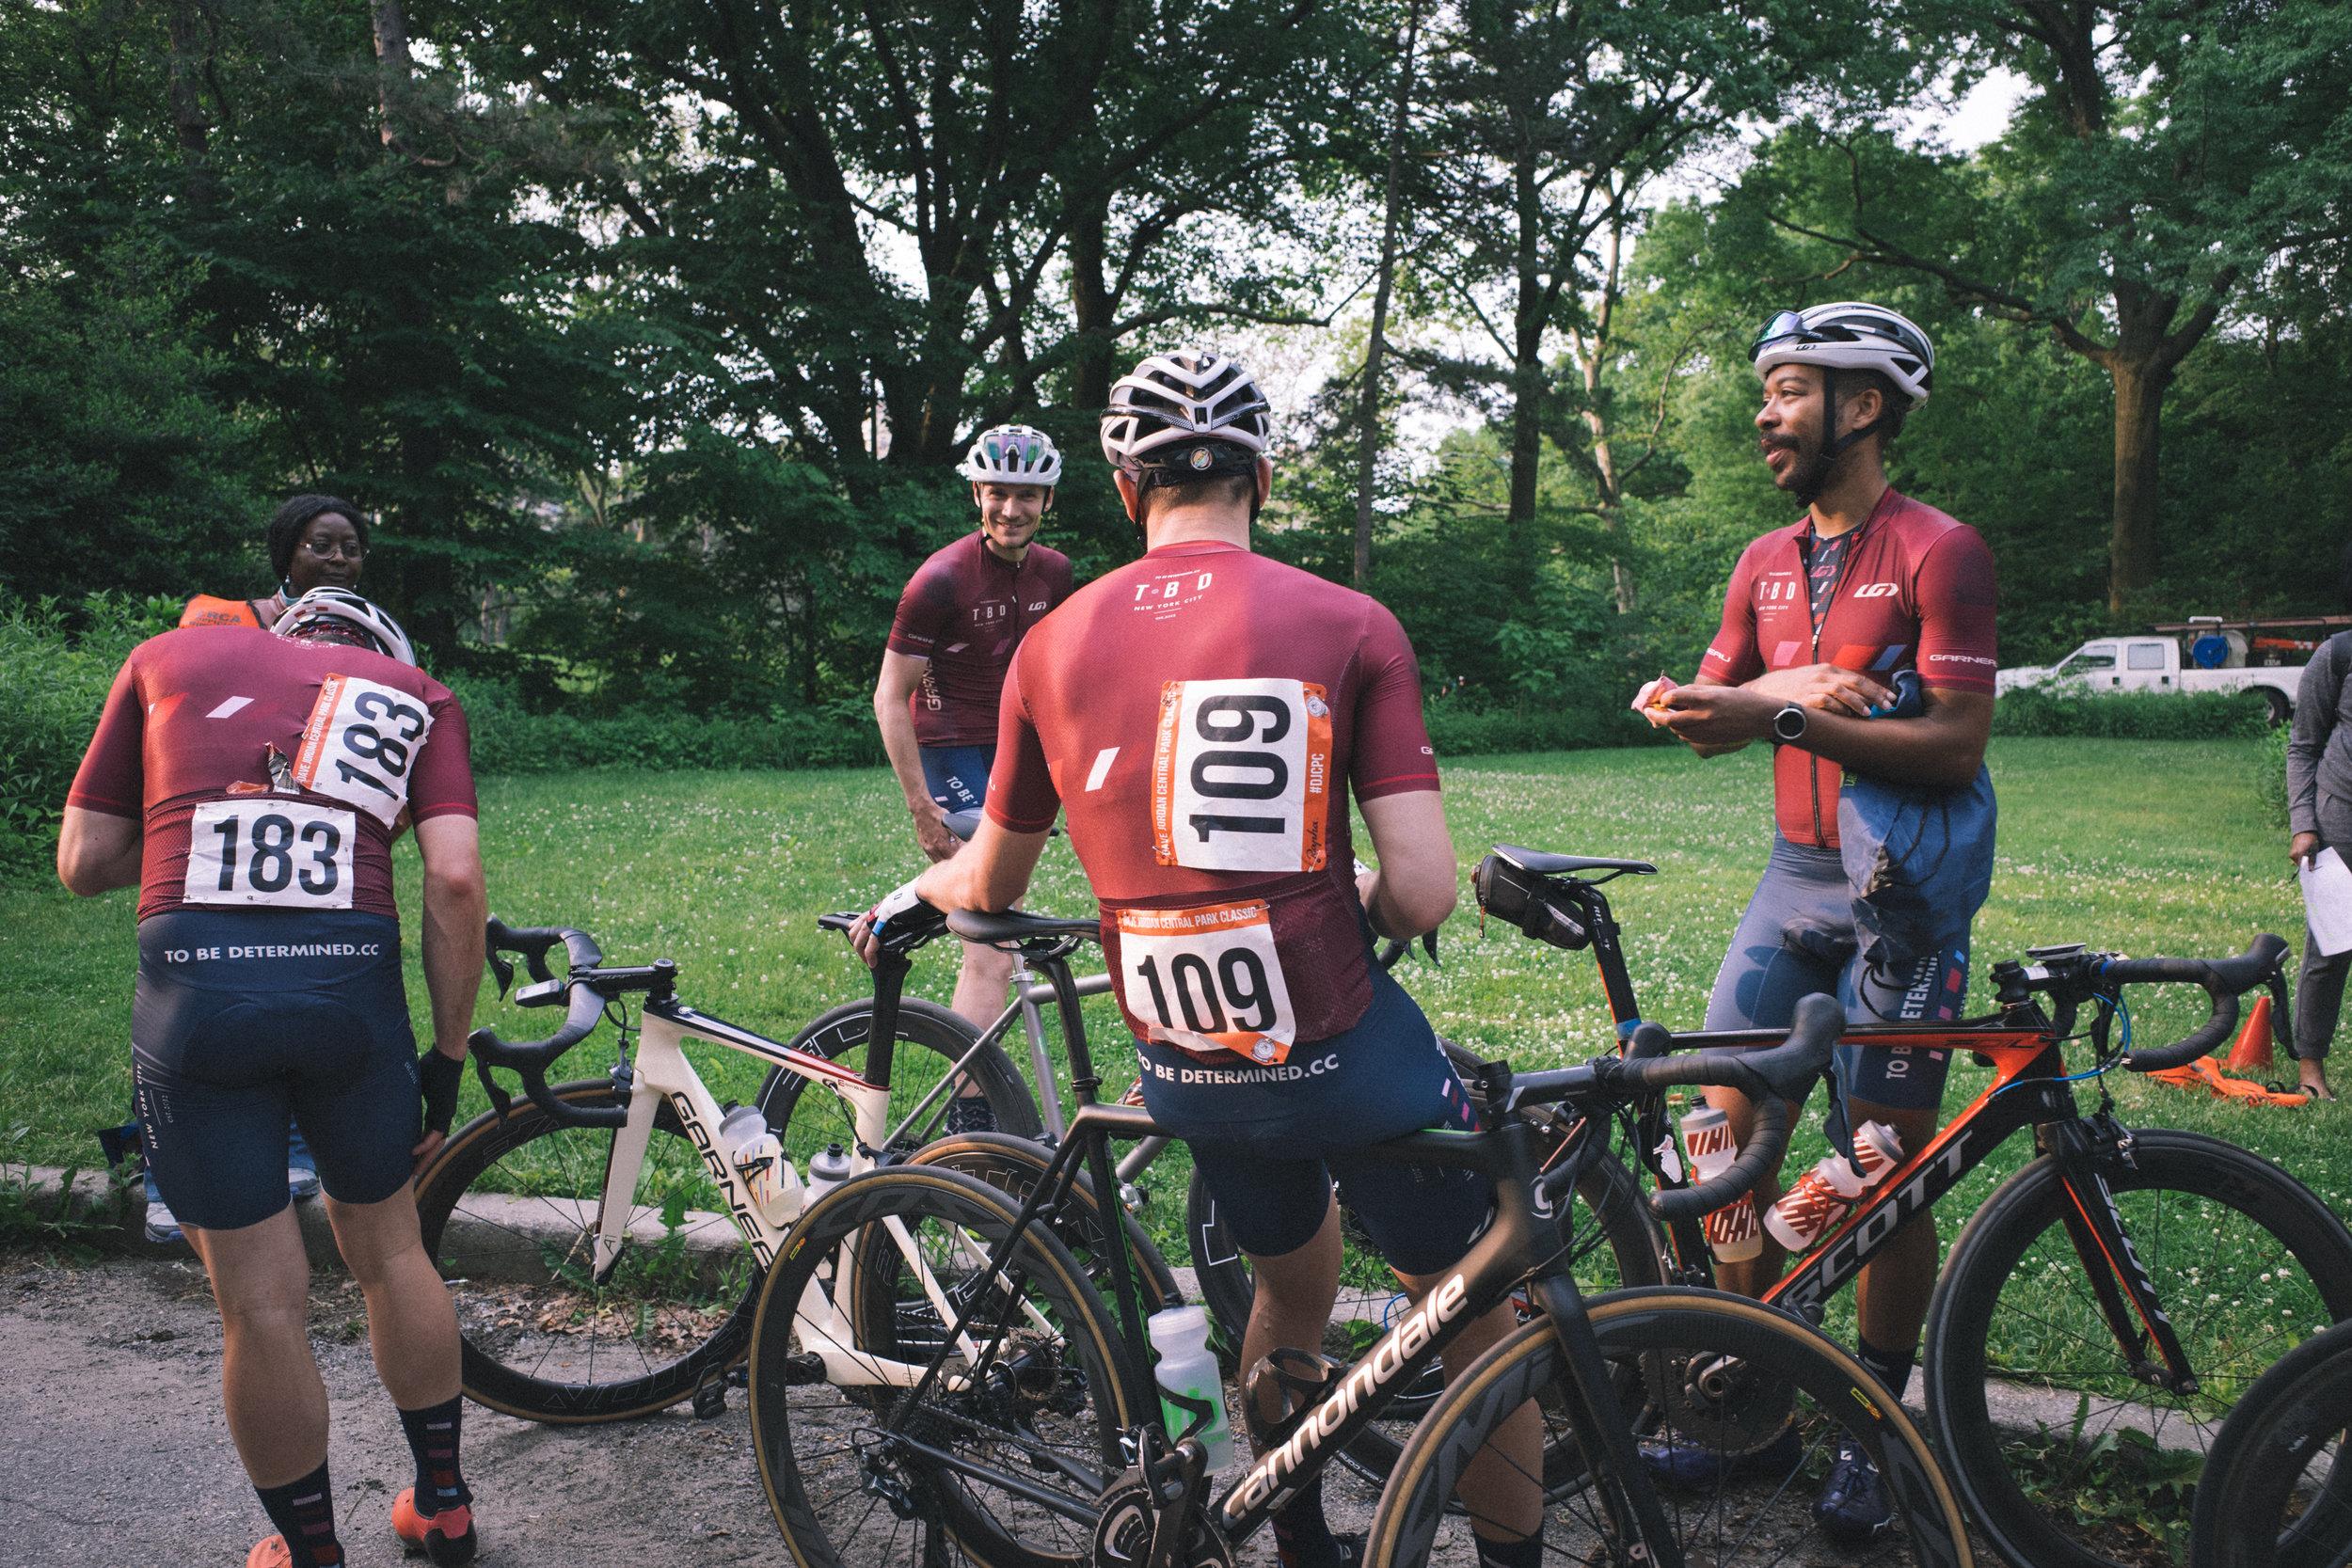 Photo Rhetoric - To Be Determined - Dave Jordan Central Park Classic-5064.jpg